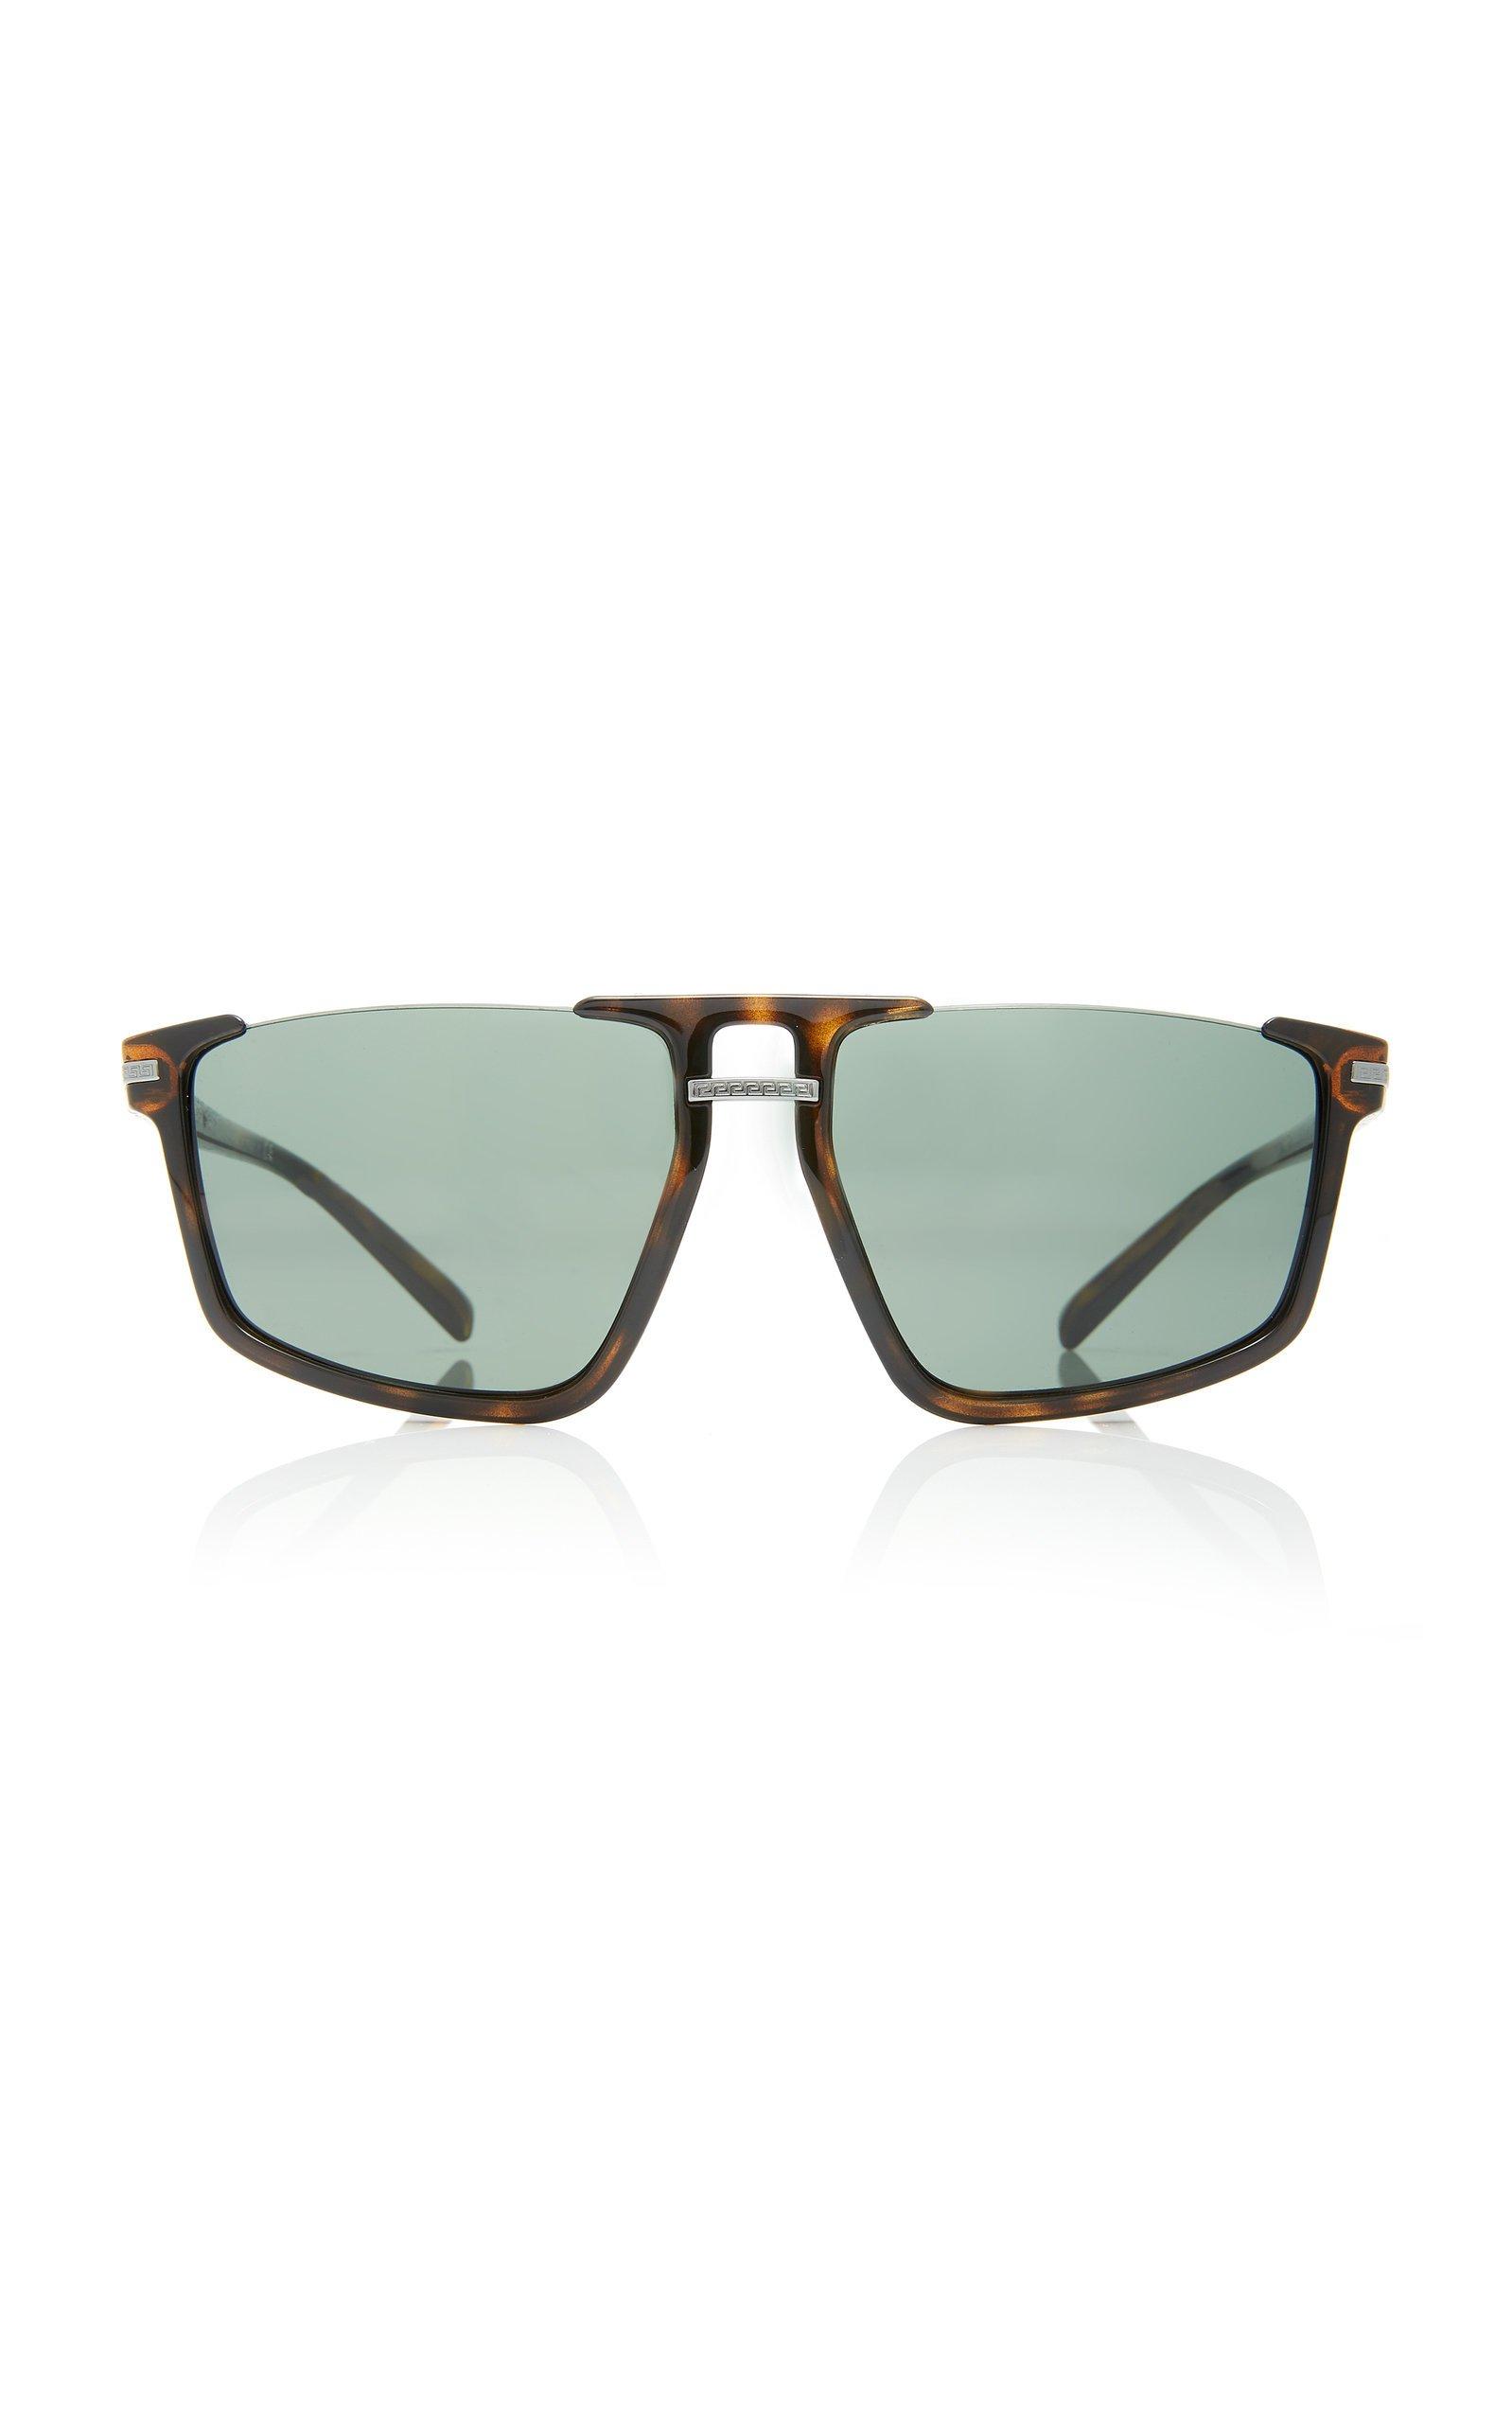 Versace Square-Frame Tortoiseshell Acetate Sunglasses